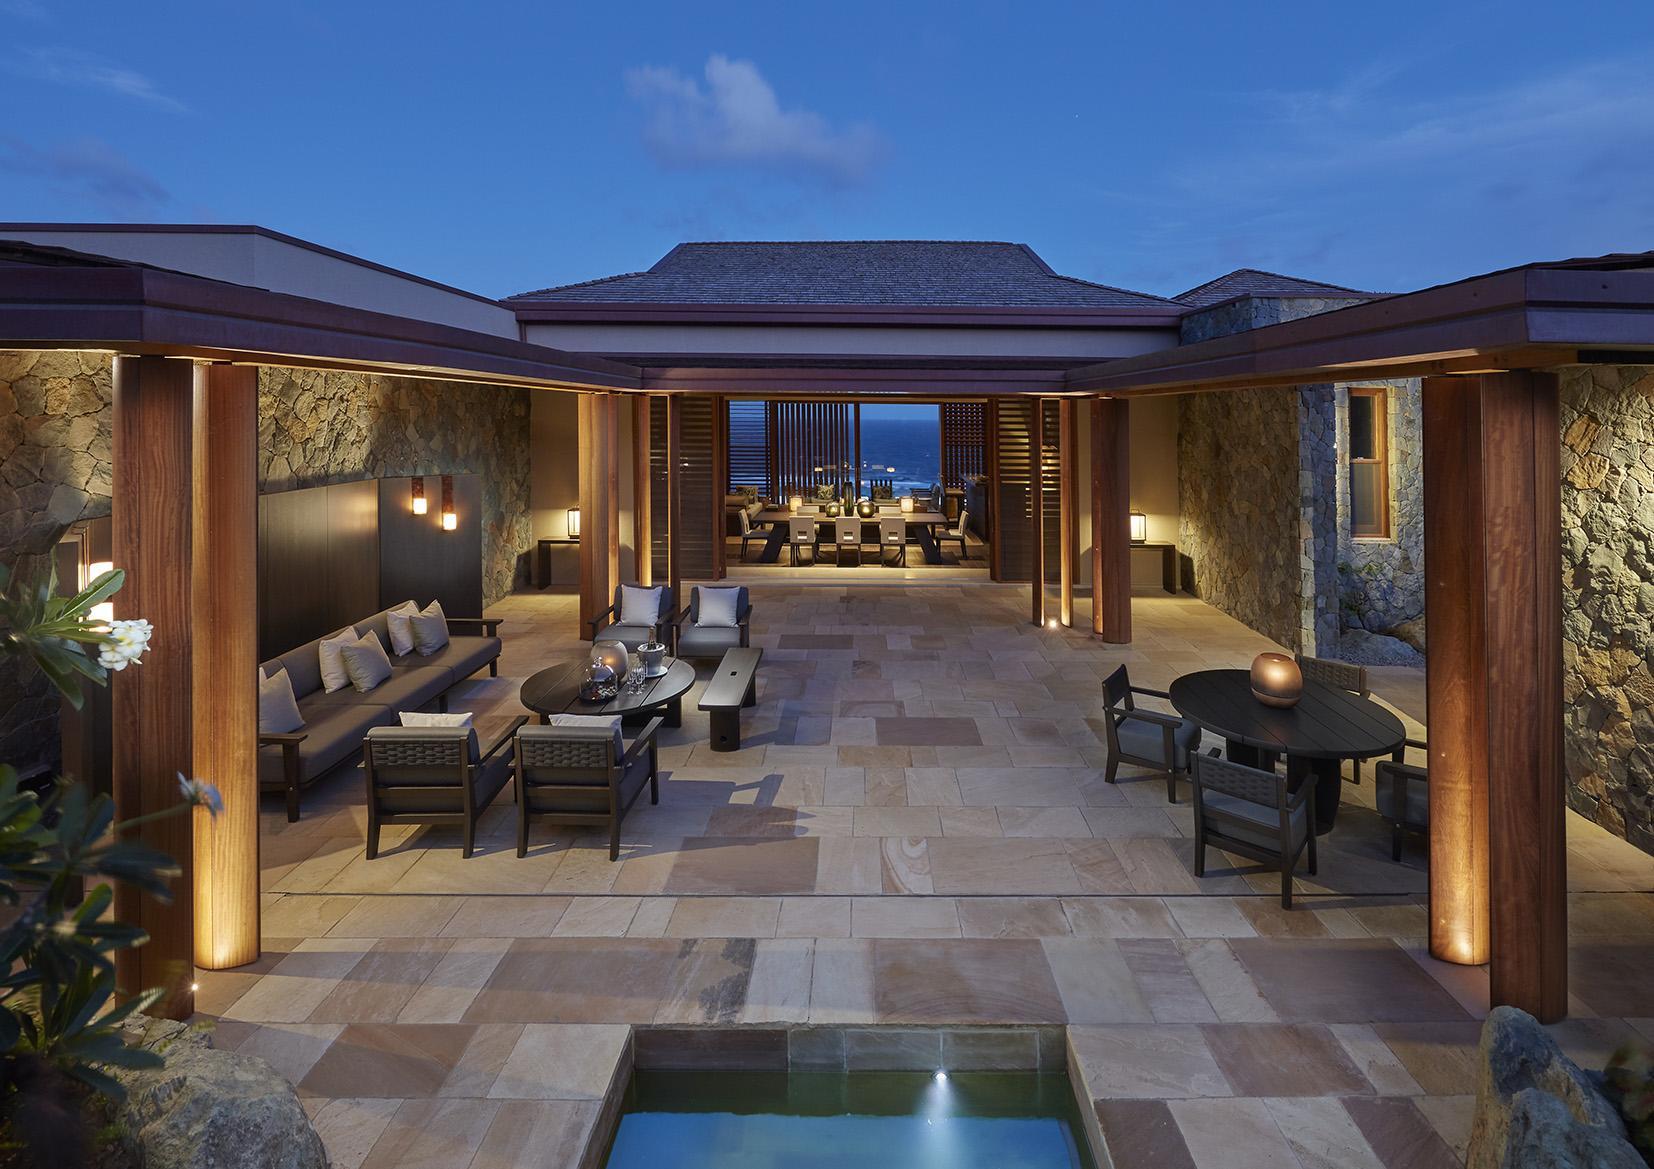 The Caribbean Island Where the Billionaires Go to Escape the Millionaires